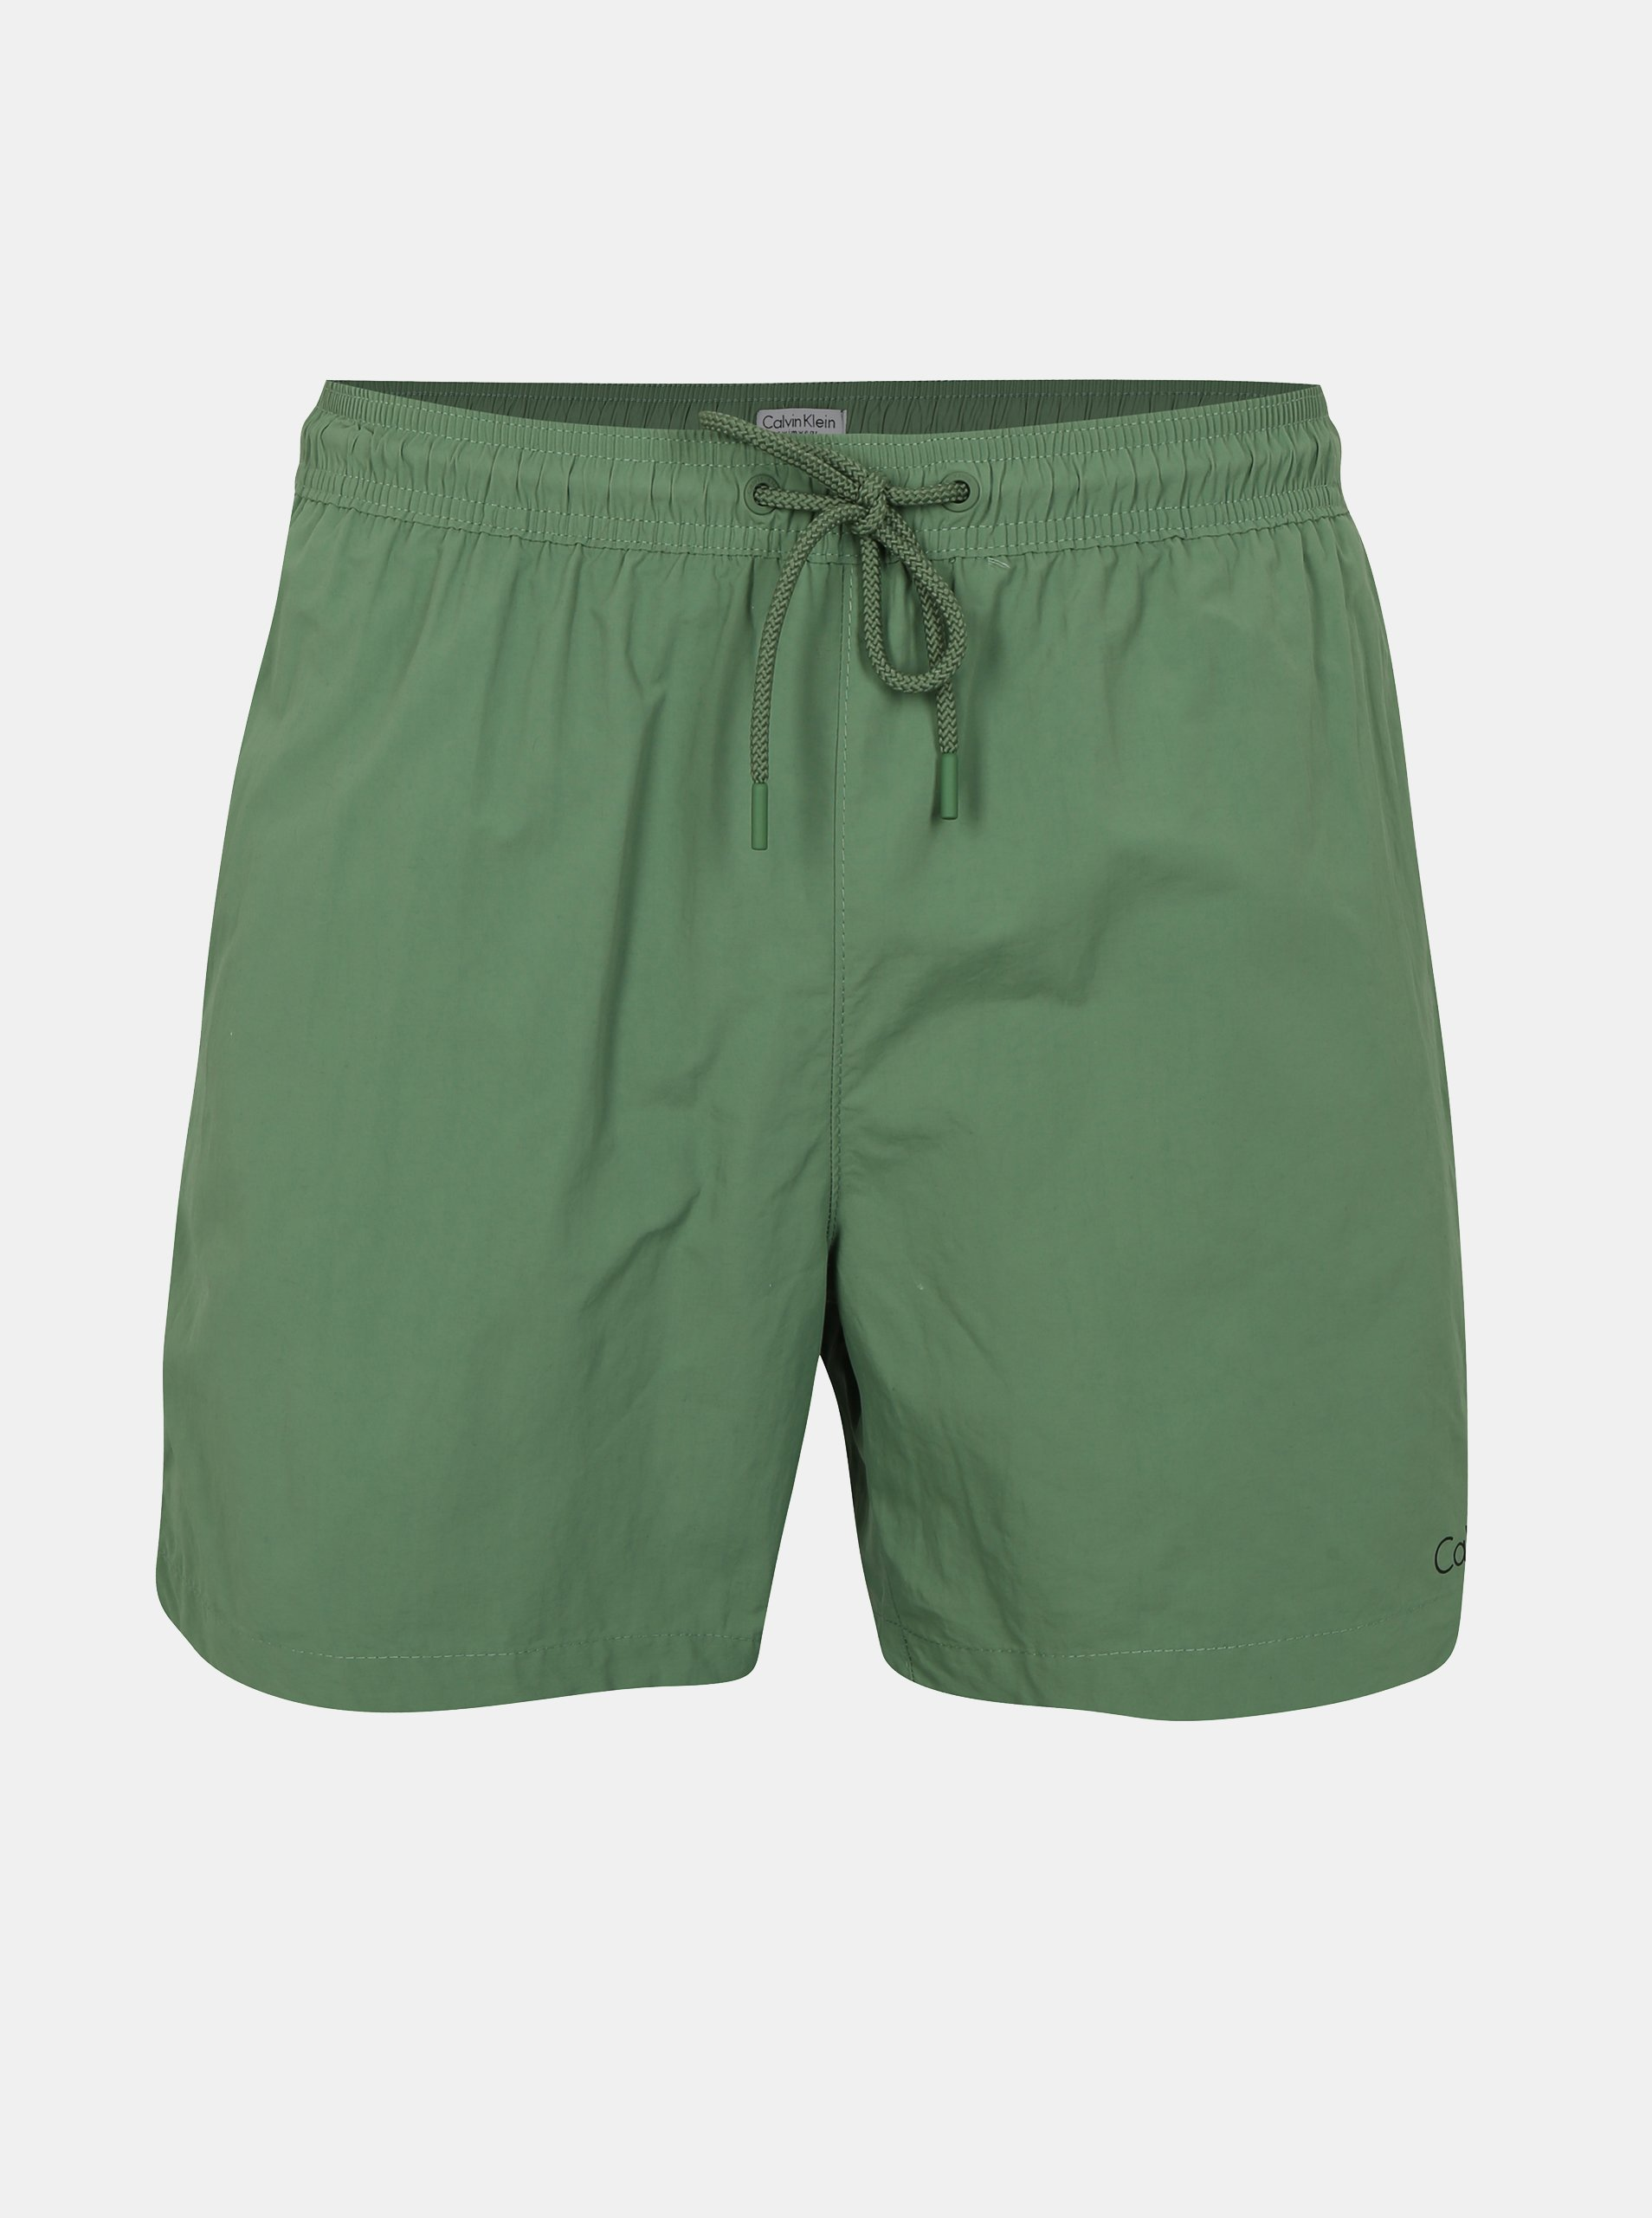 02a43a2d5f7 Zelené pánské plavky Calvin Klein Underwear